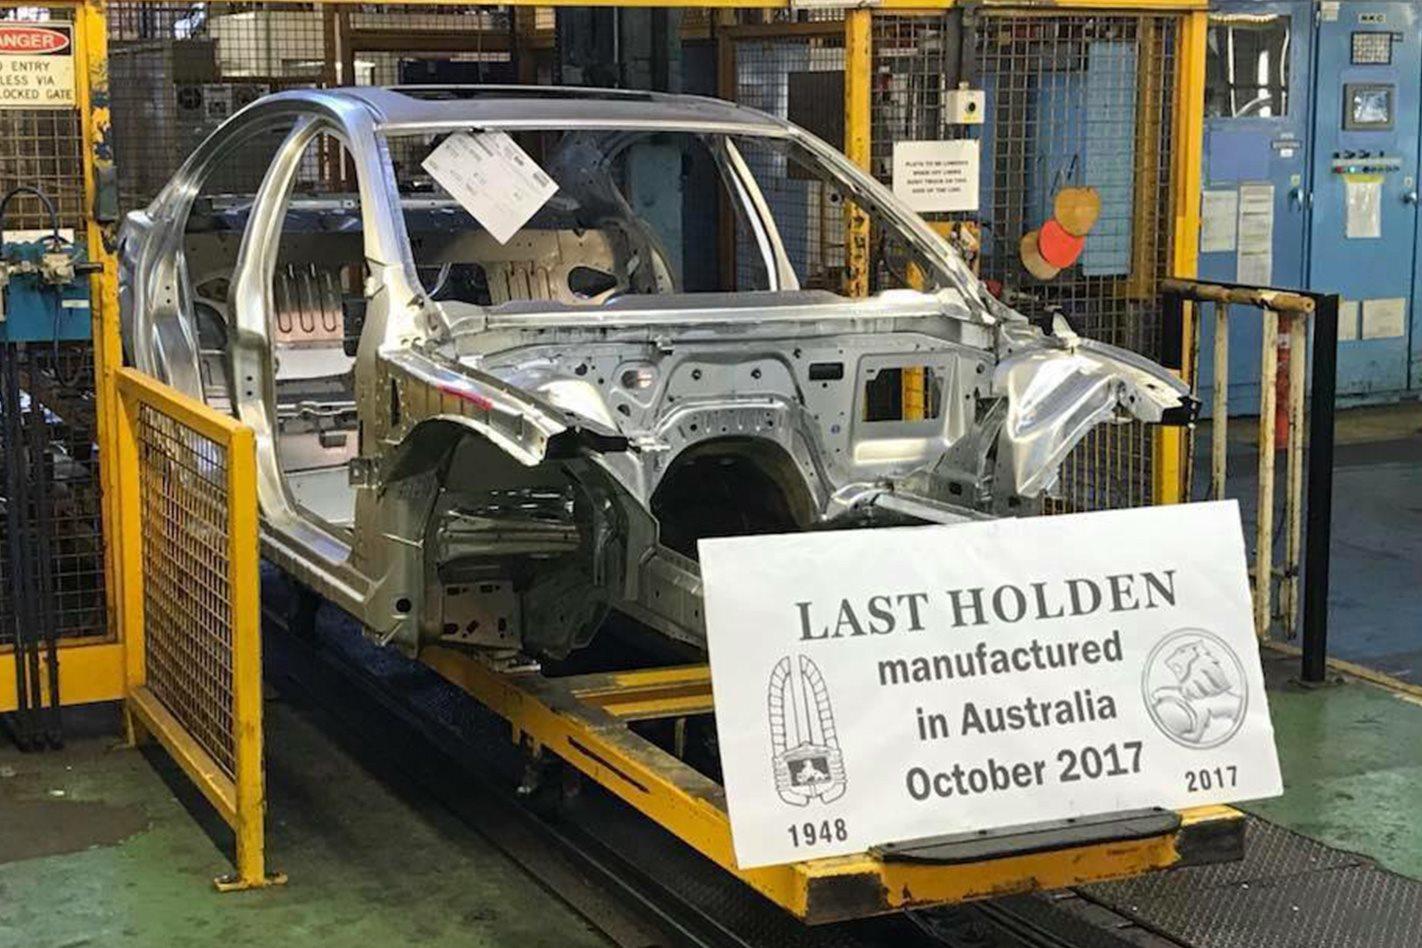 Last-Holden-Commodore-suspected.jpg